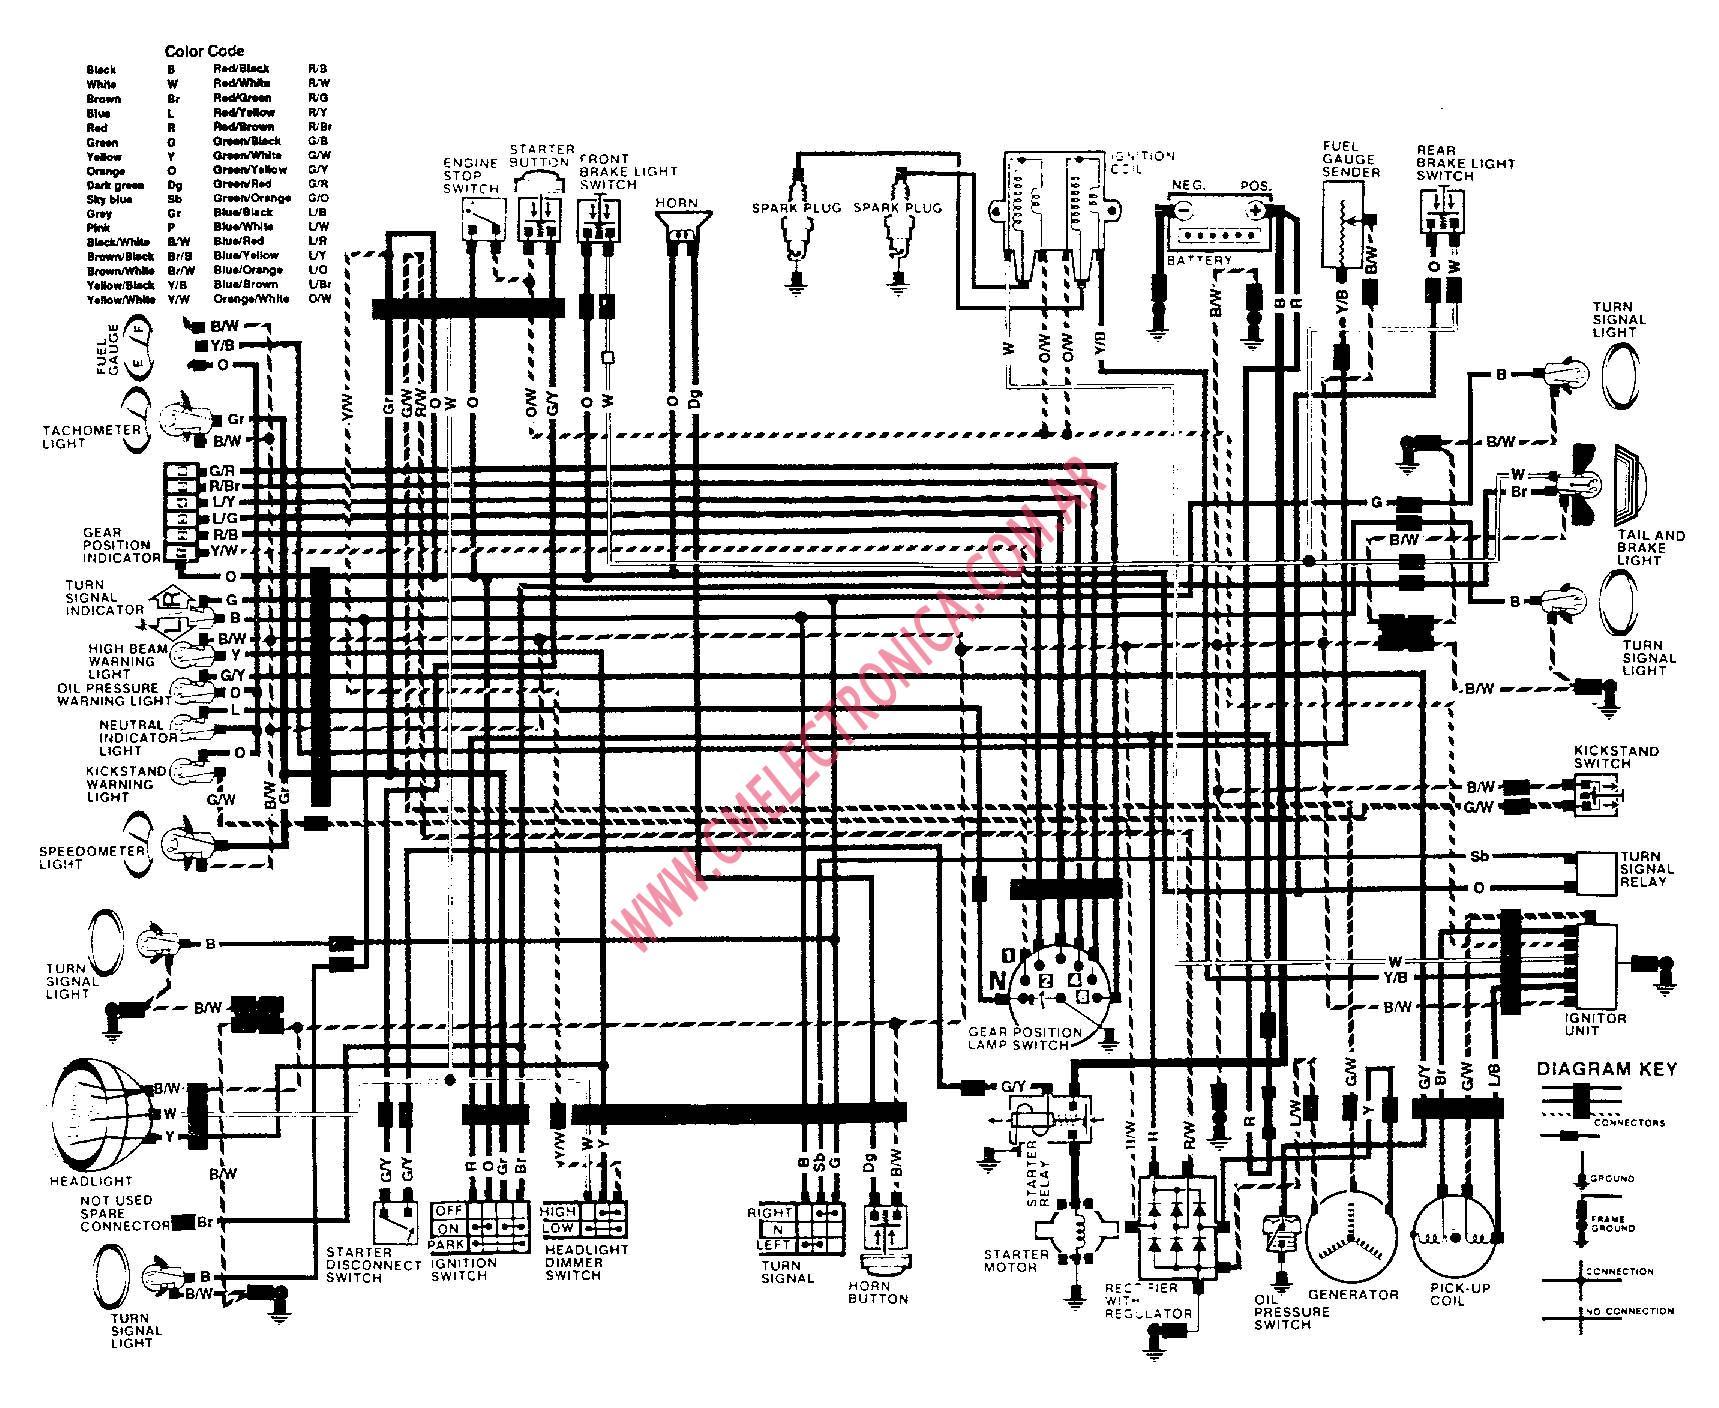 gs450 wiring diagram read all wiring diagram Schematic Diagram